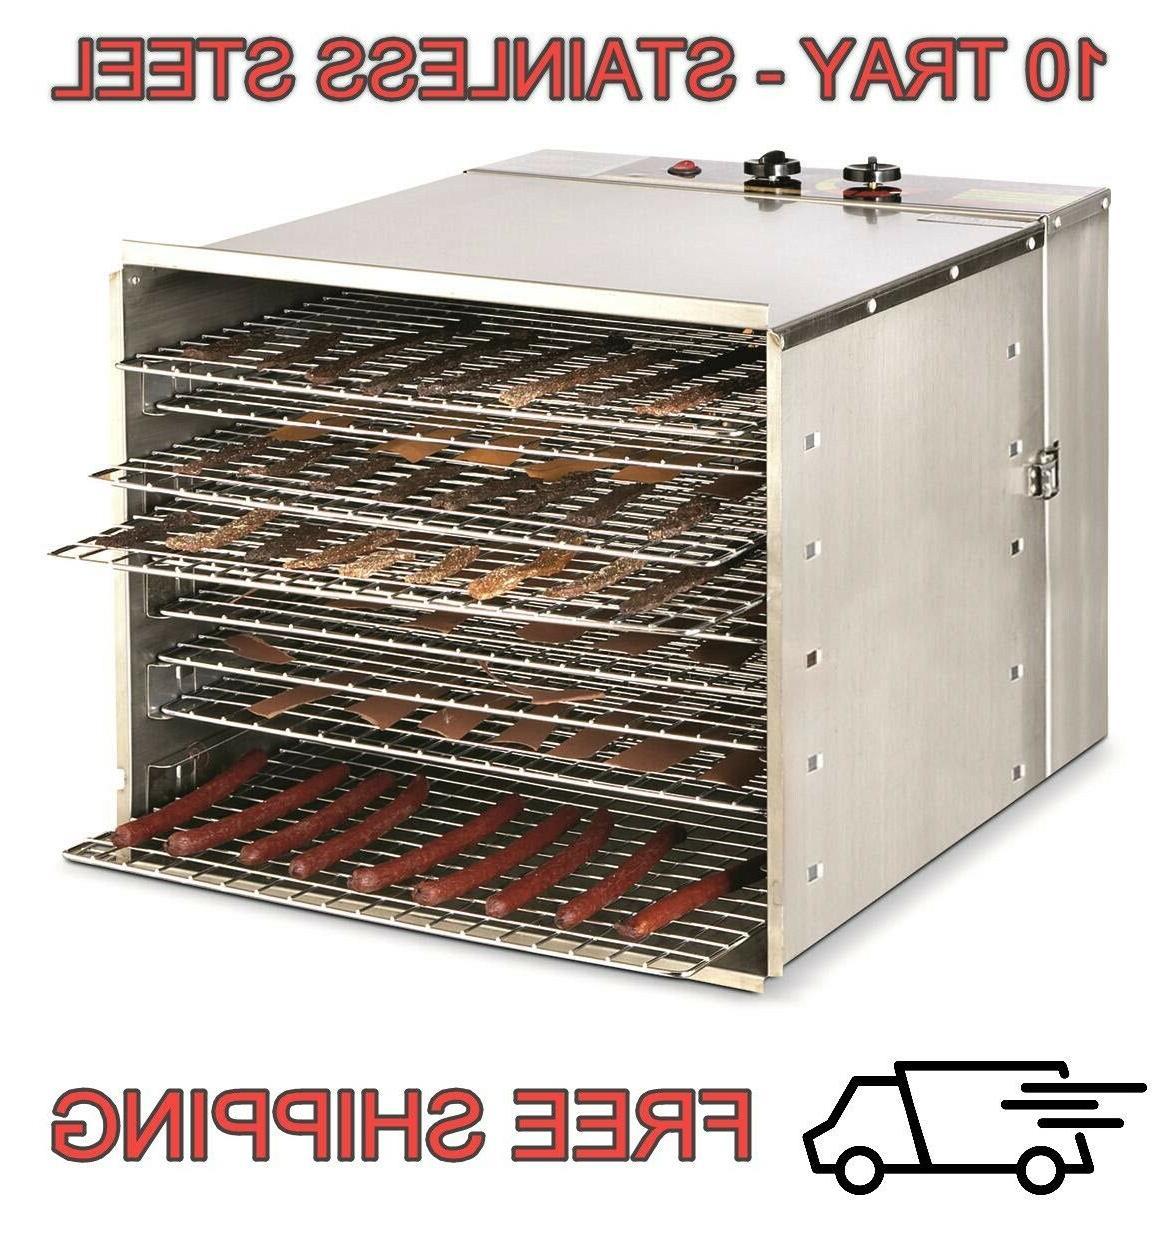 food dehydrator 10 tray stainless steel fruit